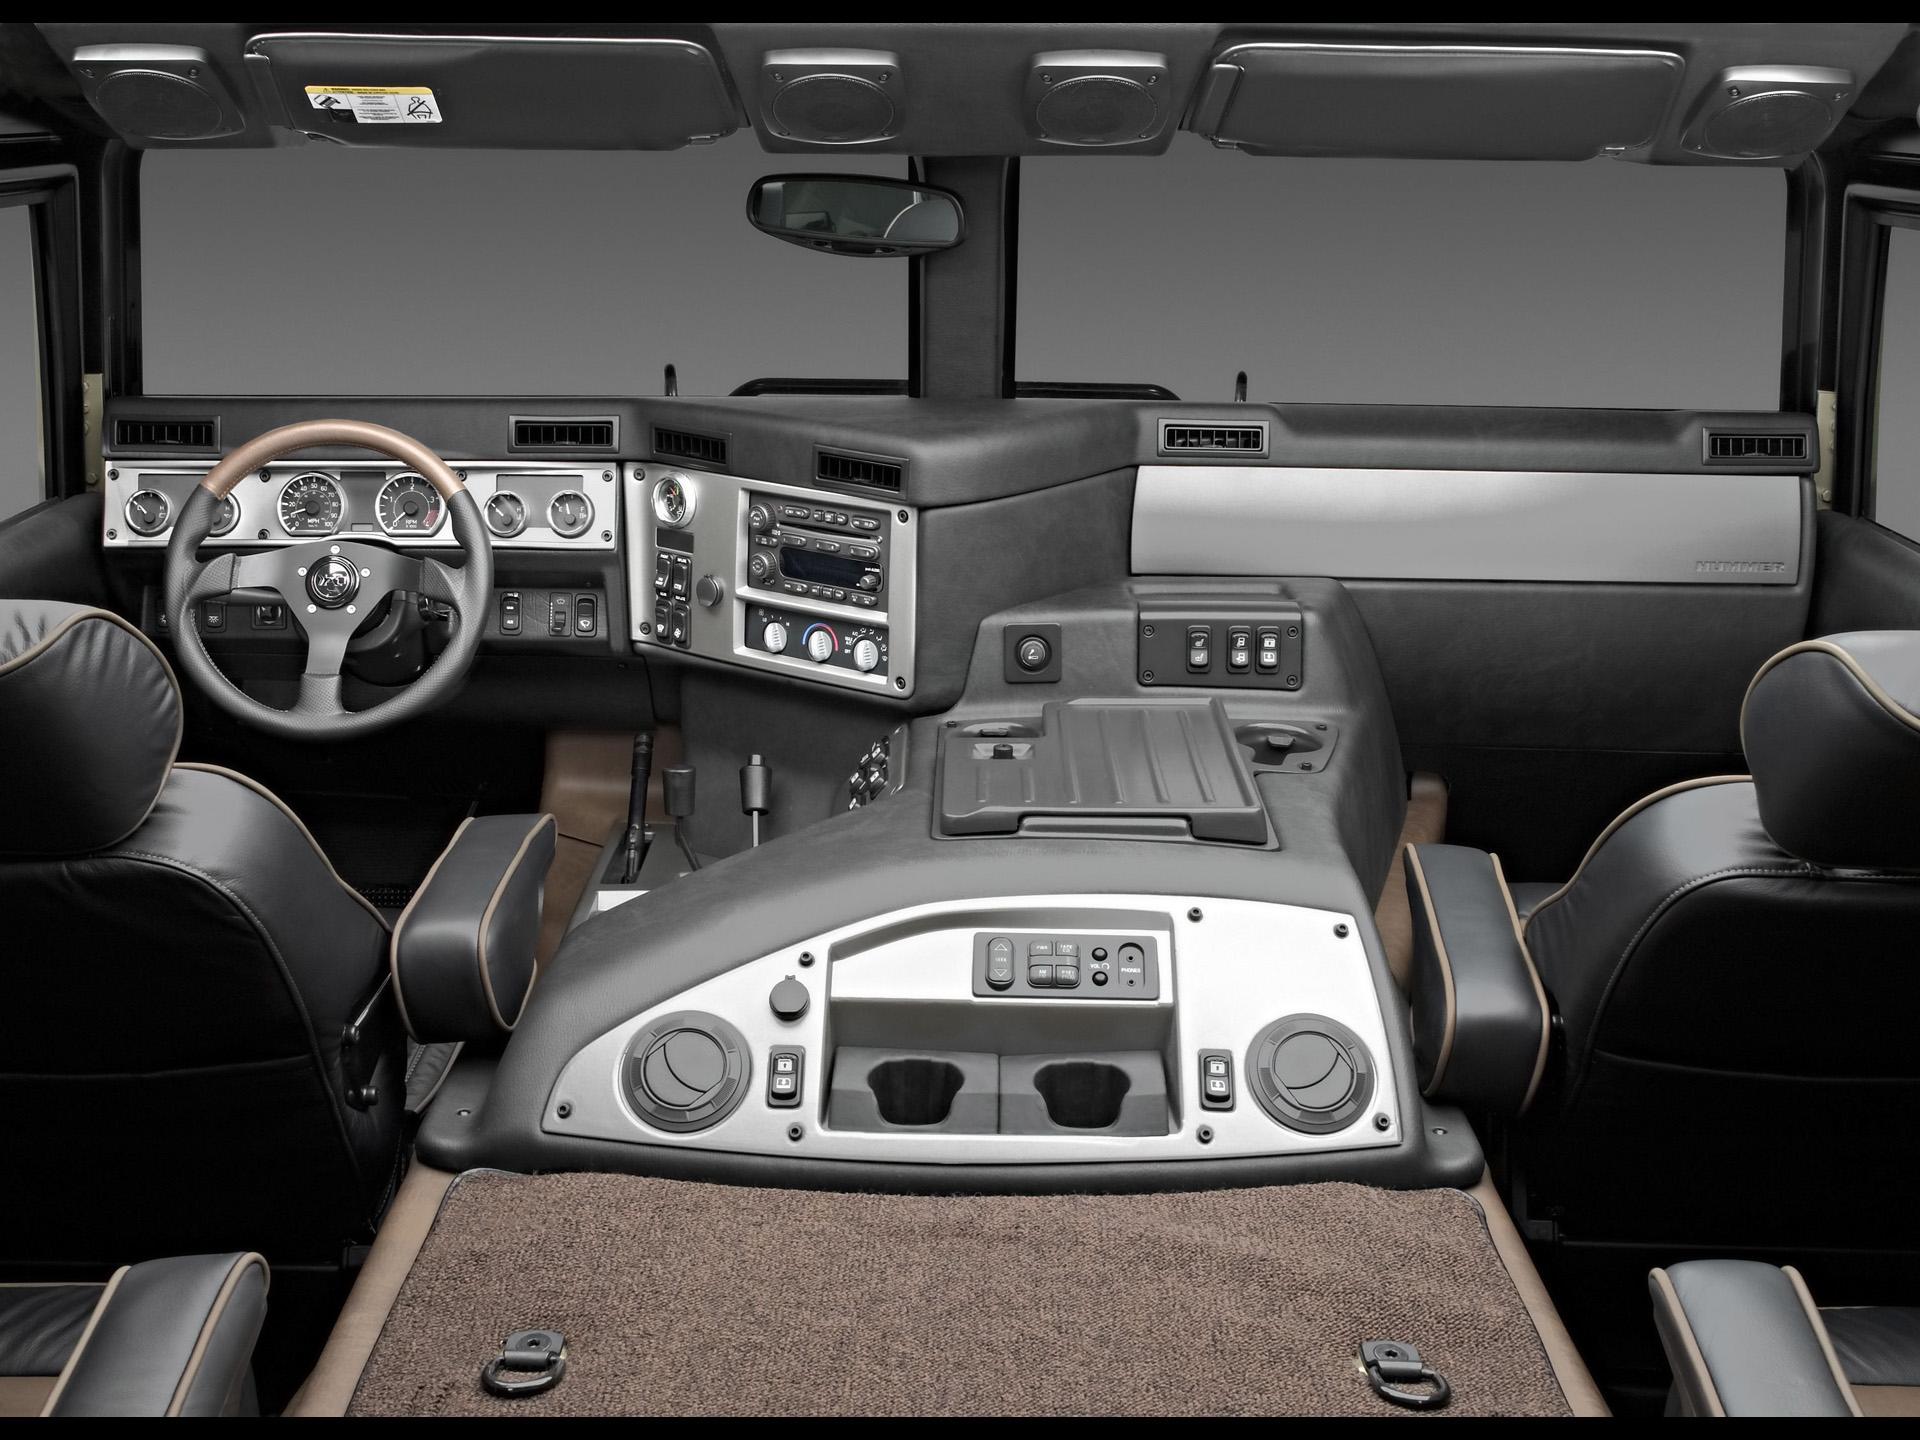 2004 Hummer H1 Interior. X04HM_H1014